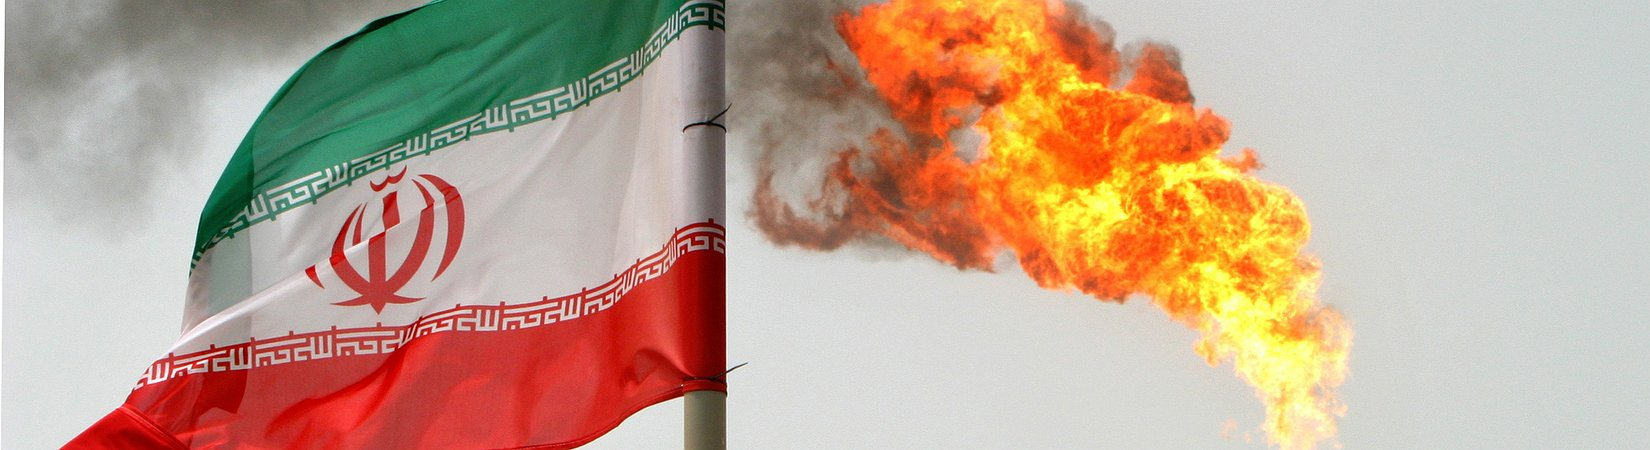 Total impulsará en Irán un proyecto de 5.400 millones de euros